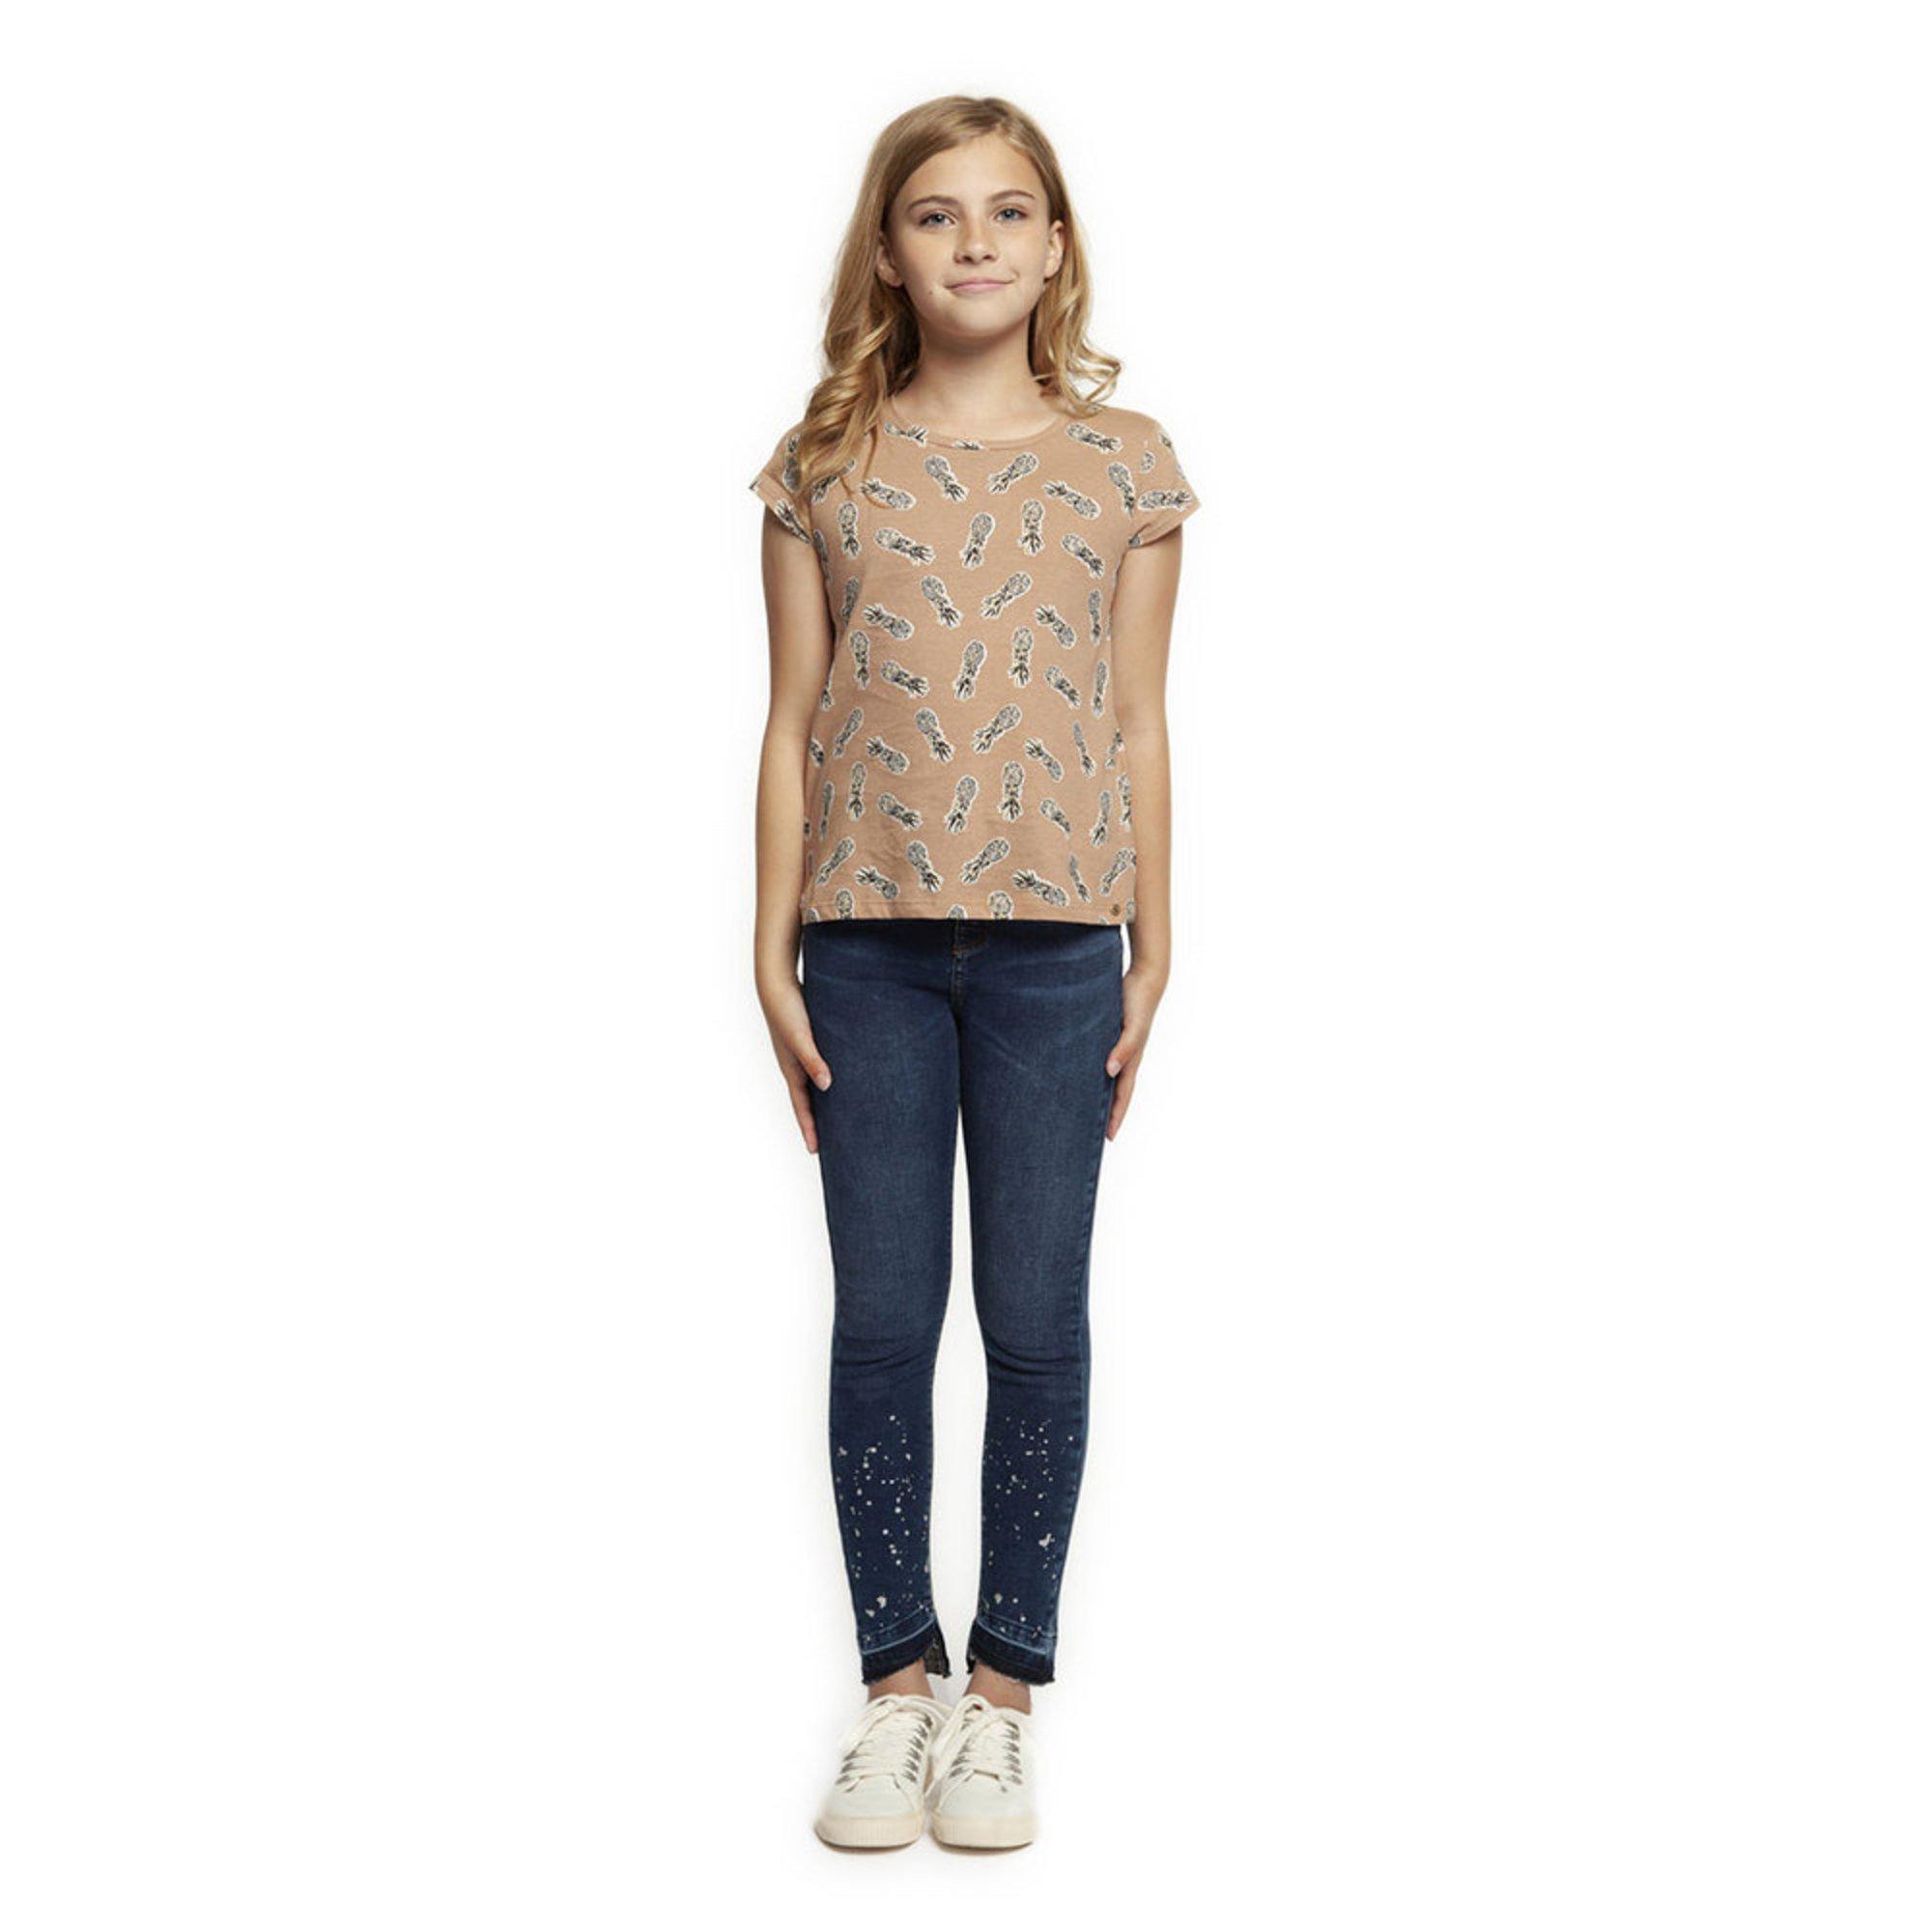 045b99ec Dex Big Girl's' Denim Pants With Foil Detail | Big Girls' Pants ...